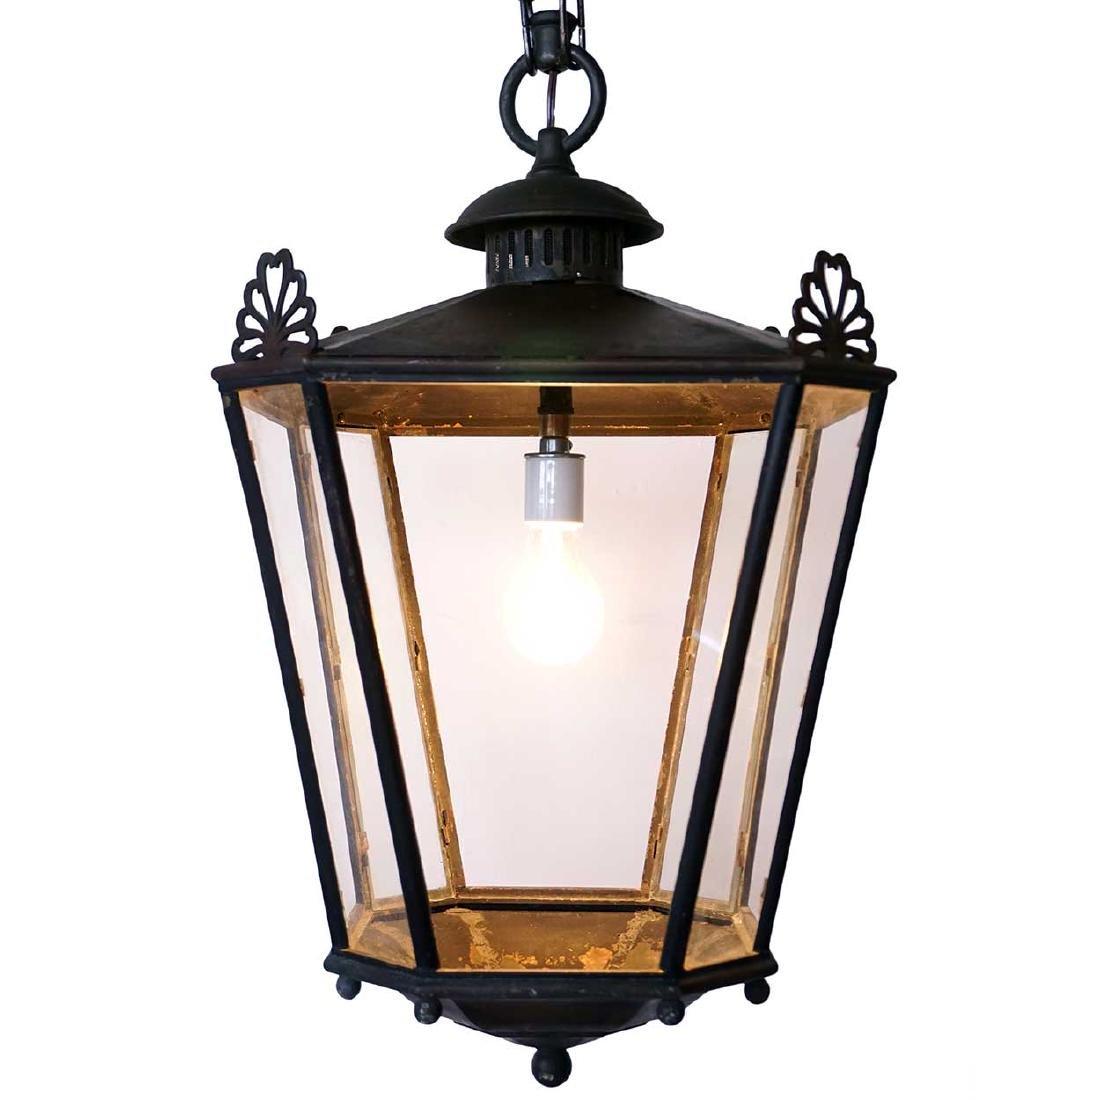 English Heavy Patinated Bronze 1-Light Hanging Lantern